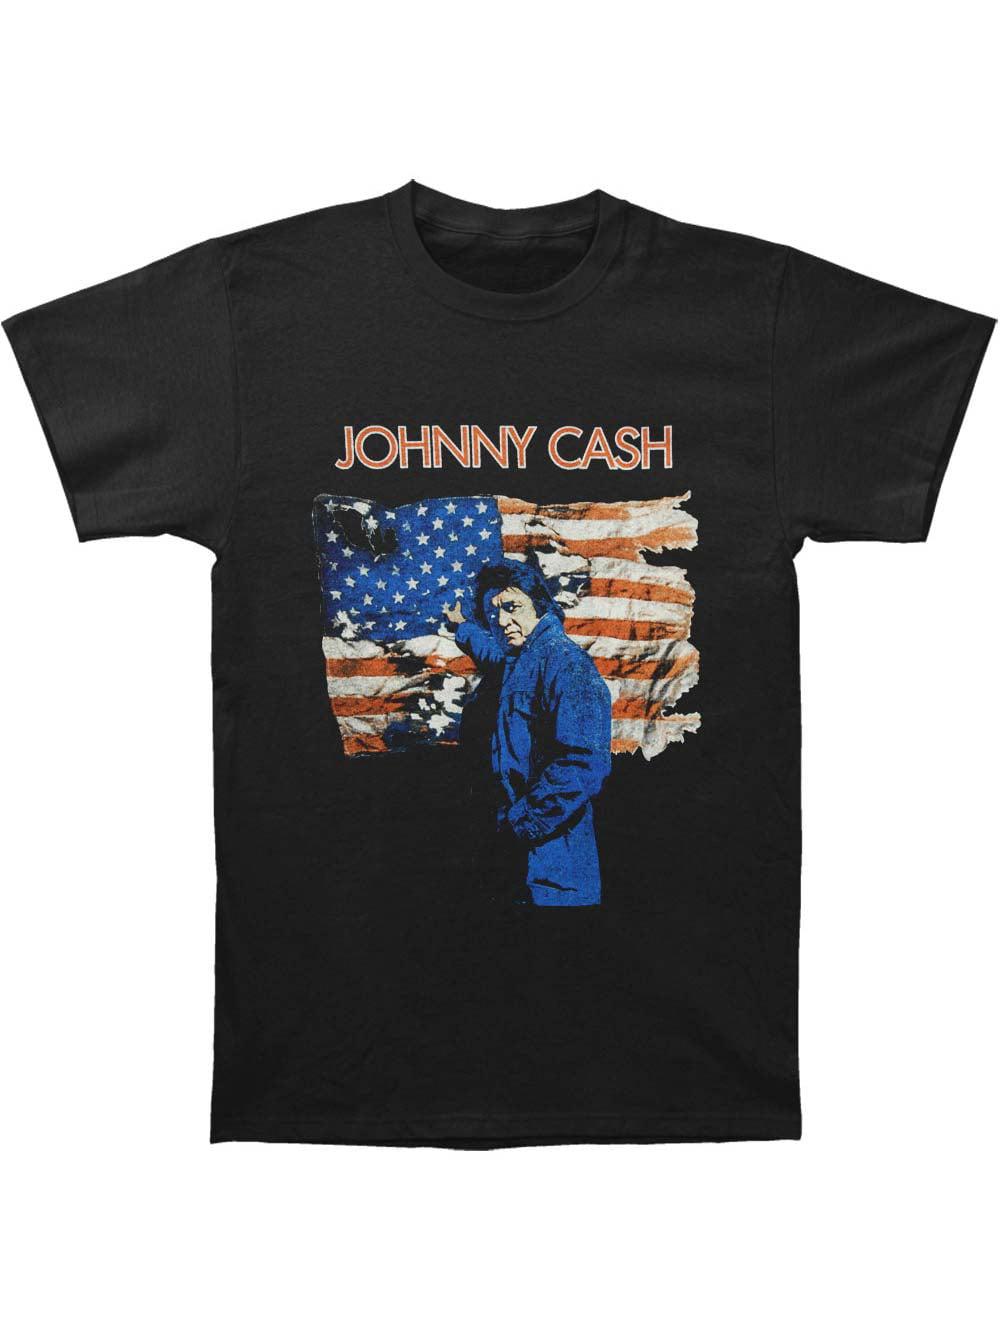 Johnny Cash Ragged Old Flag M 2XL Black T-Shirt L XL